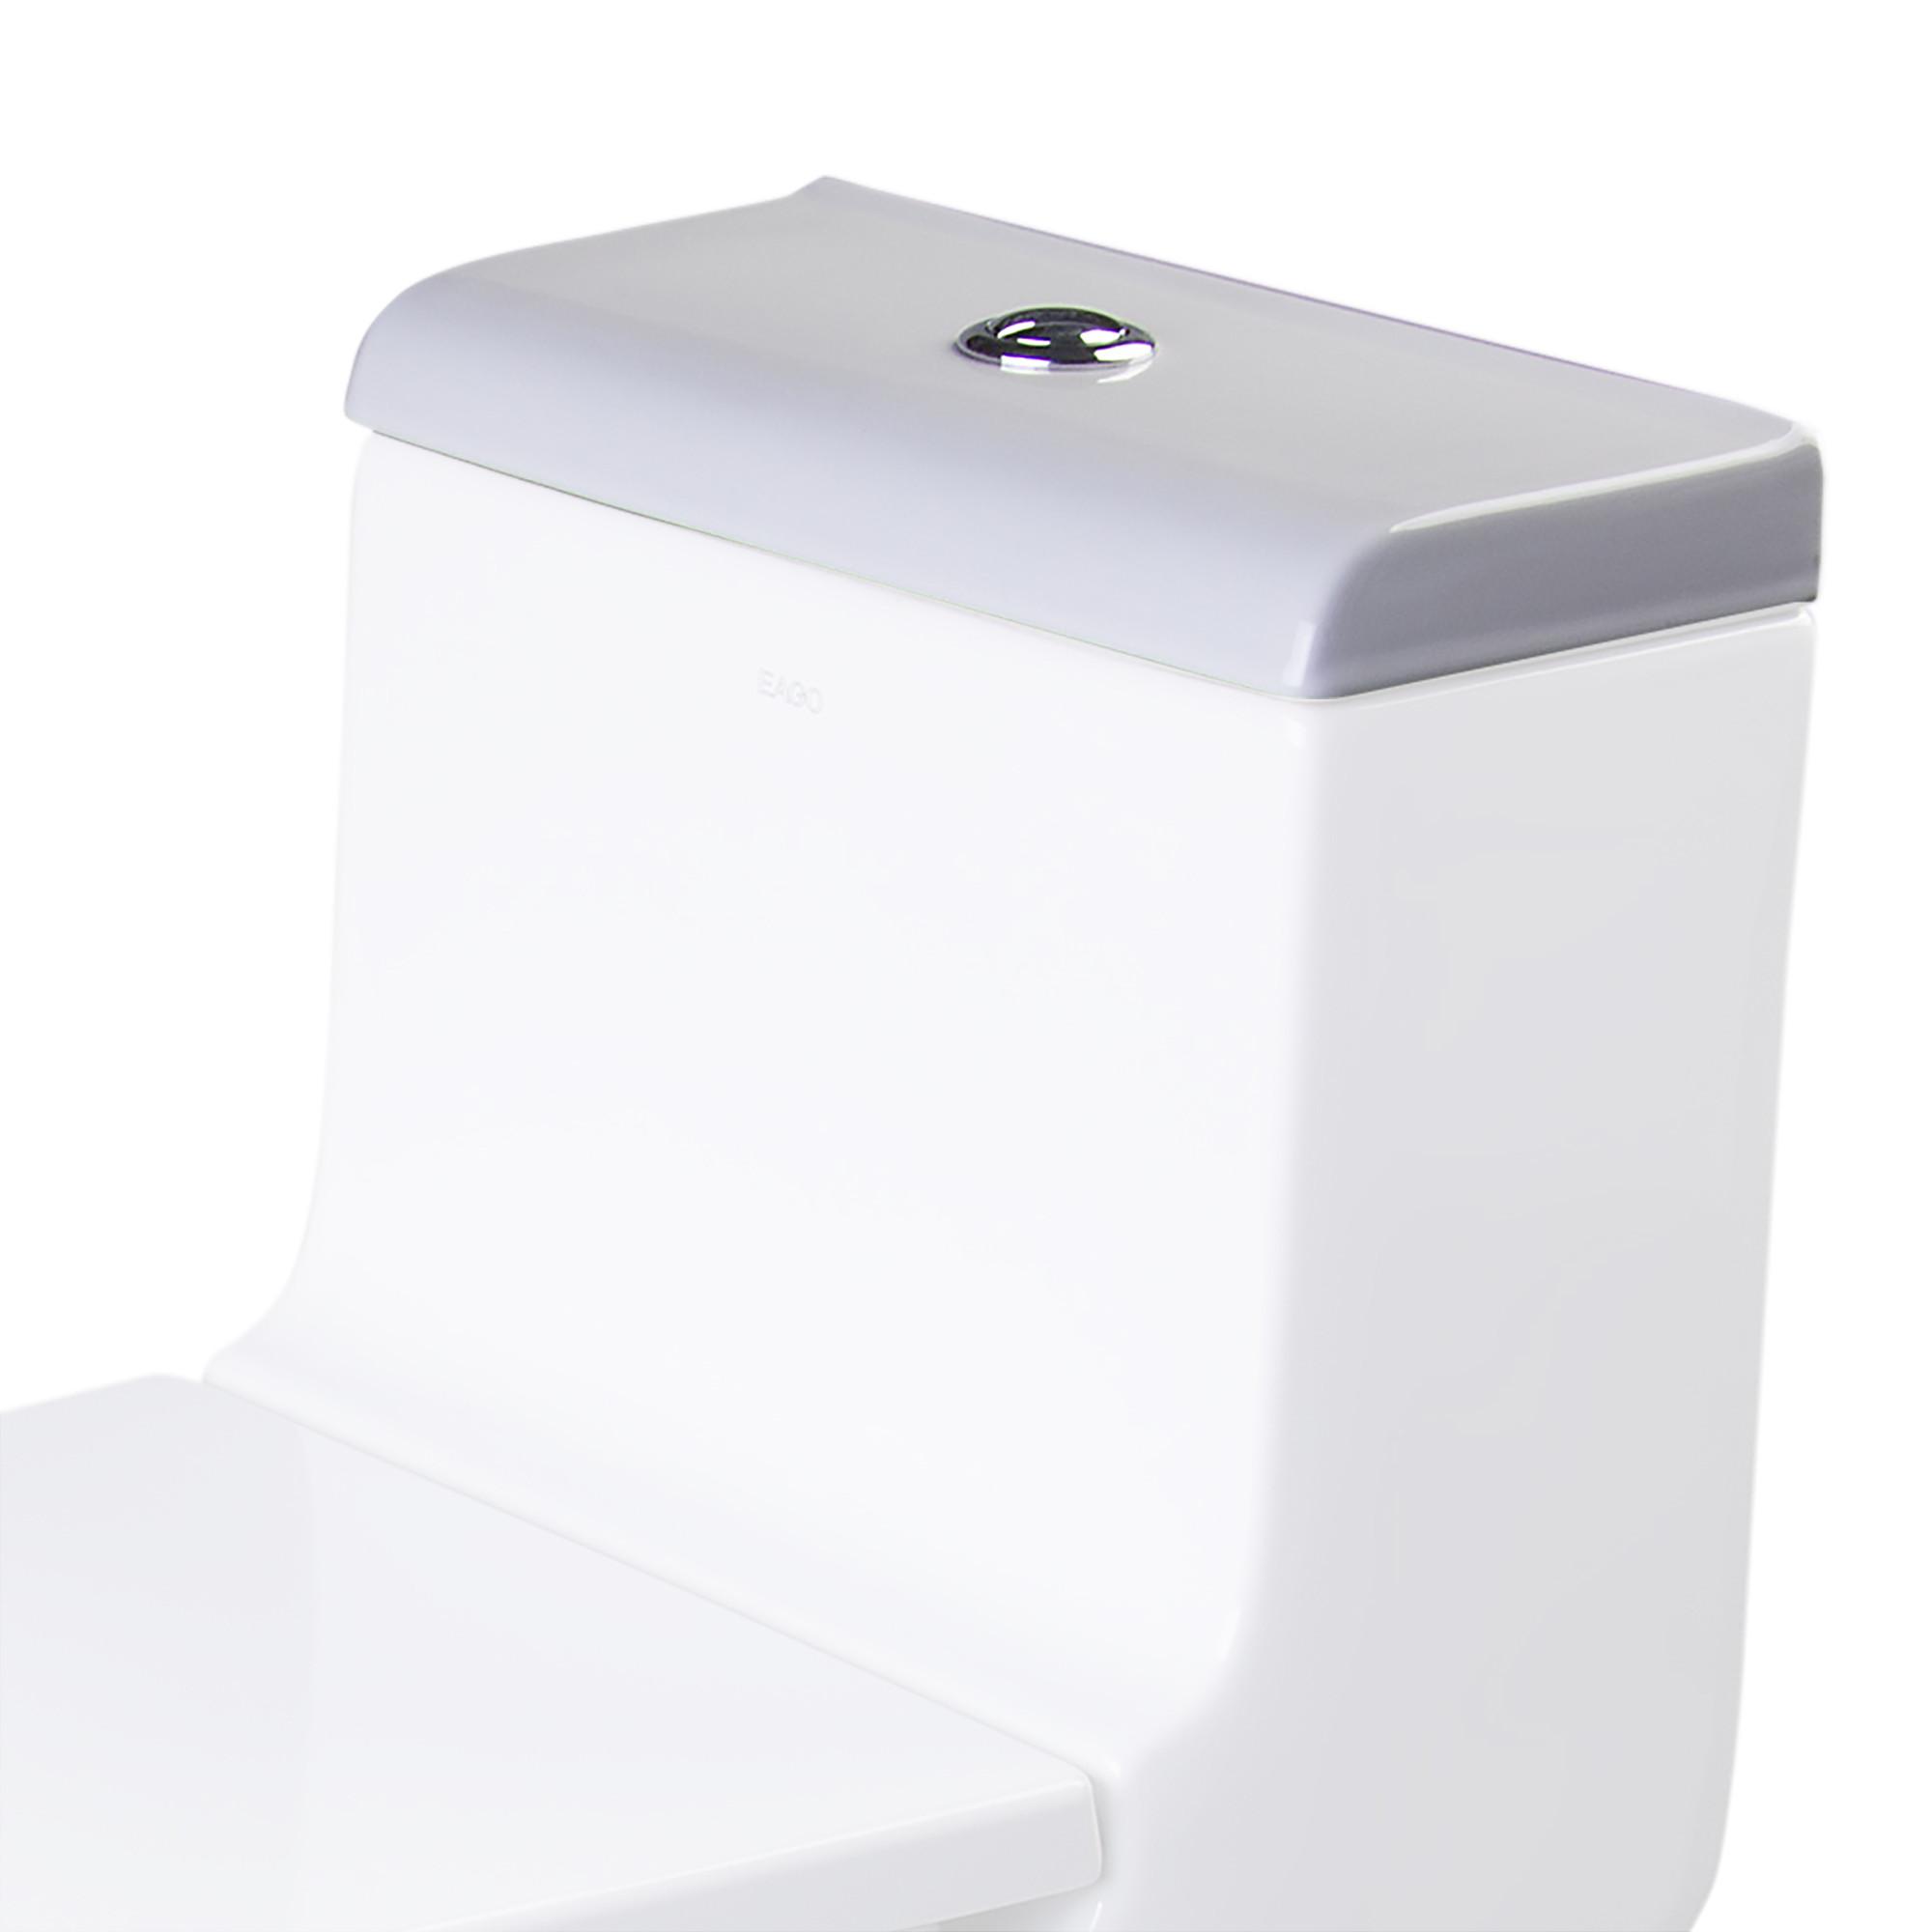 EAGO R-356LID Replacement Ceramic Toilet Lid for TB356